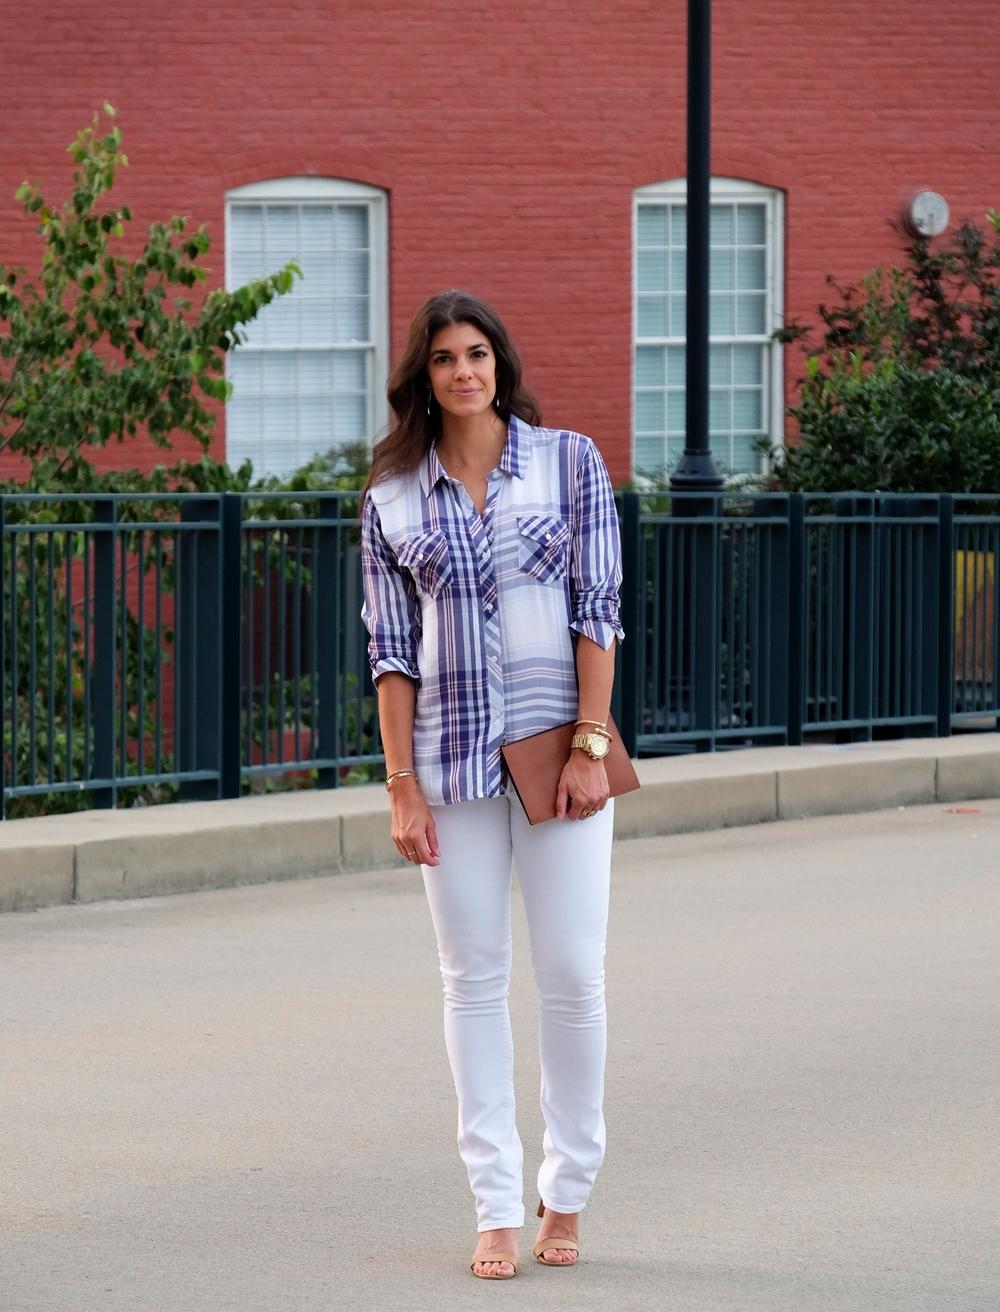 LaurenSchwaiger-Life-Style-Blog-Rails-White-Blue-Plaid-Shirt-Summer-Style.jpg